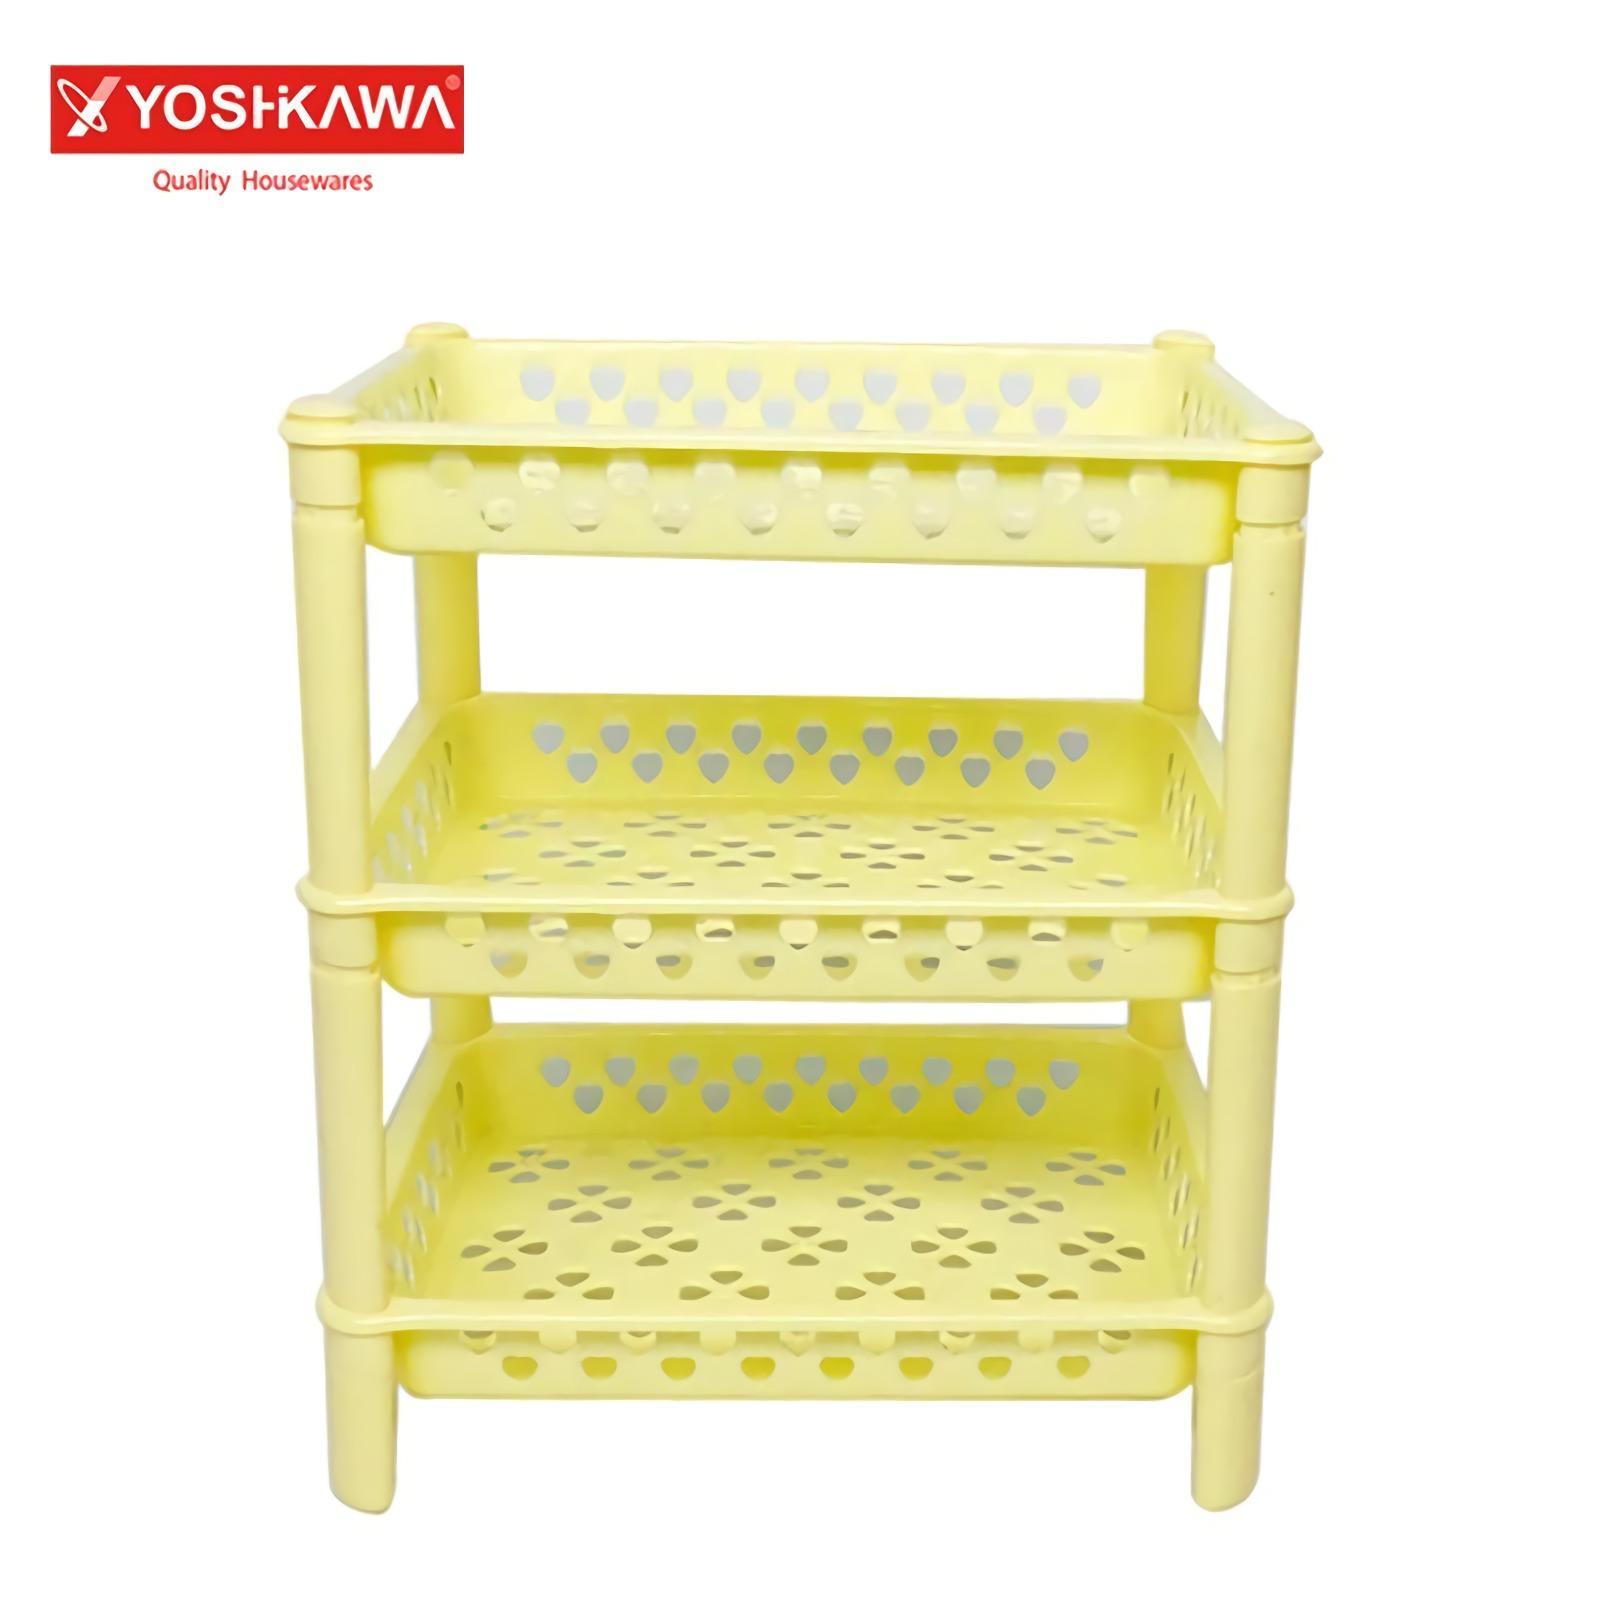 Yoshikawa Rak Susun Serbaguna 3 Tingkat Plastik Multifungsi Organizer Dapur Rumah Evl-R-0130-3 By Good Spot.